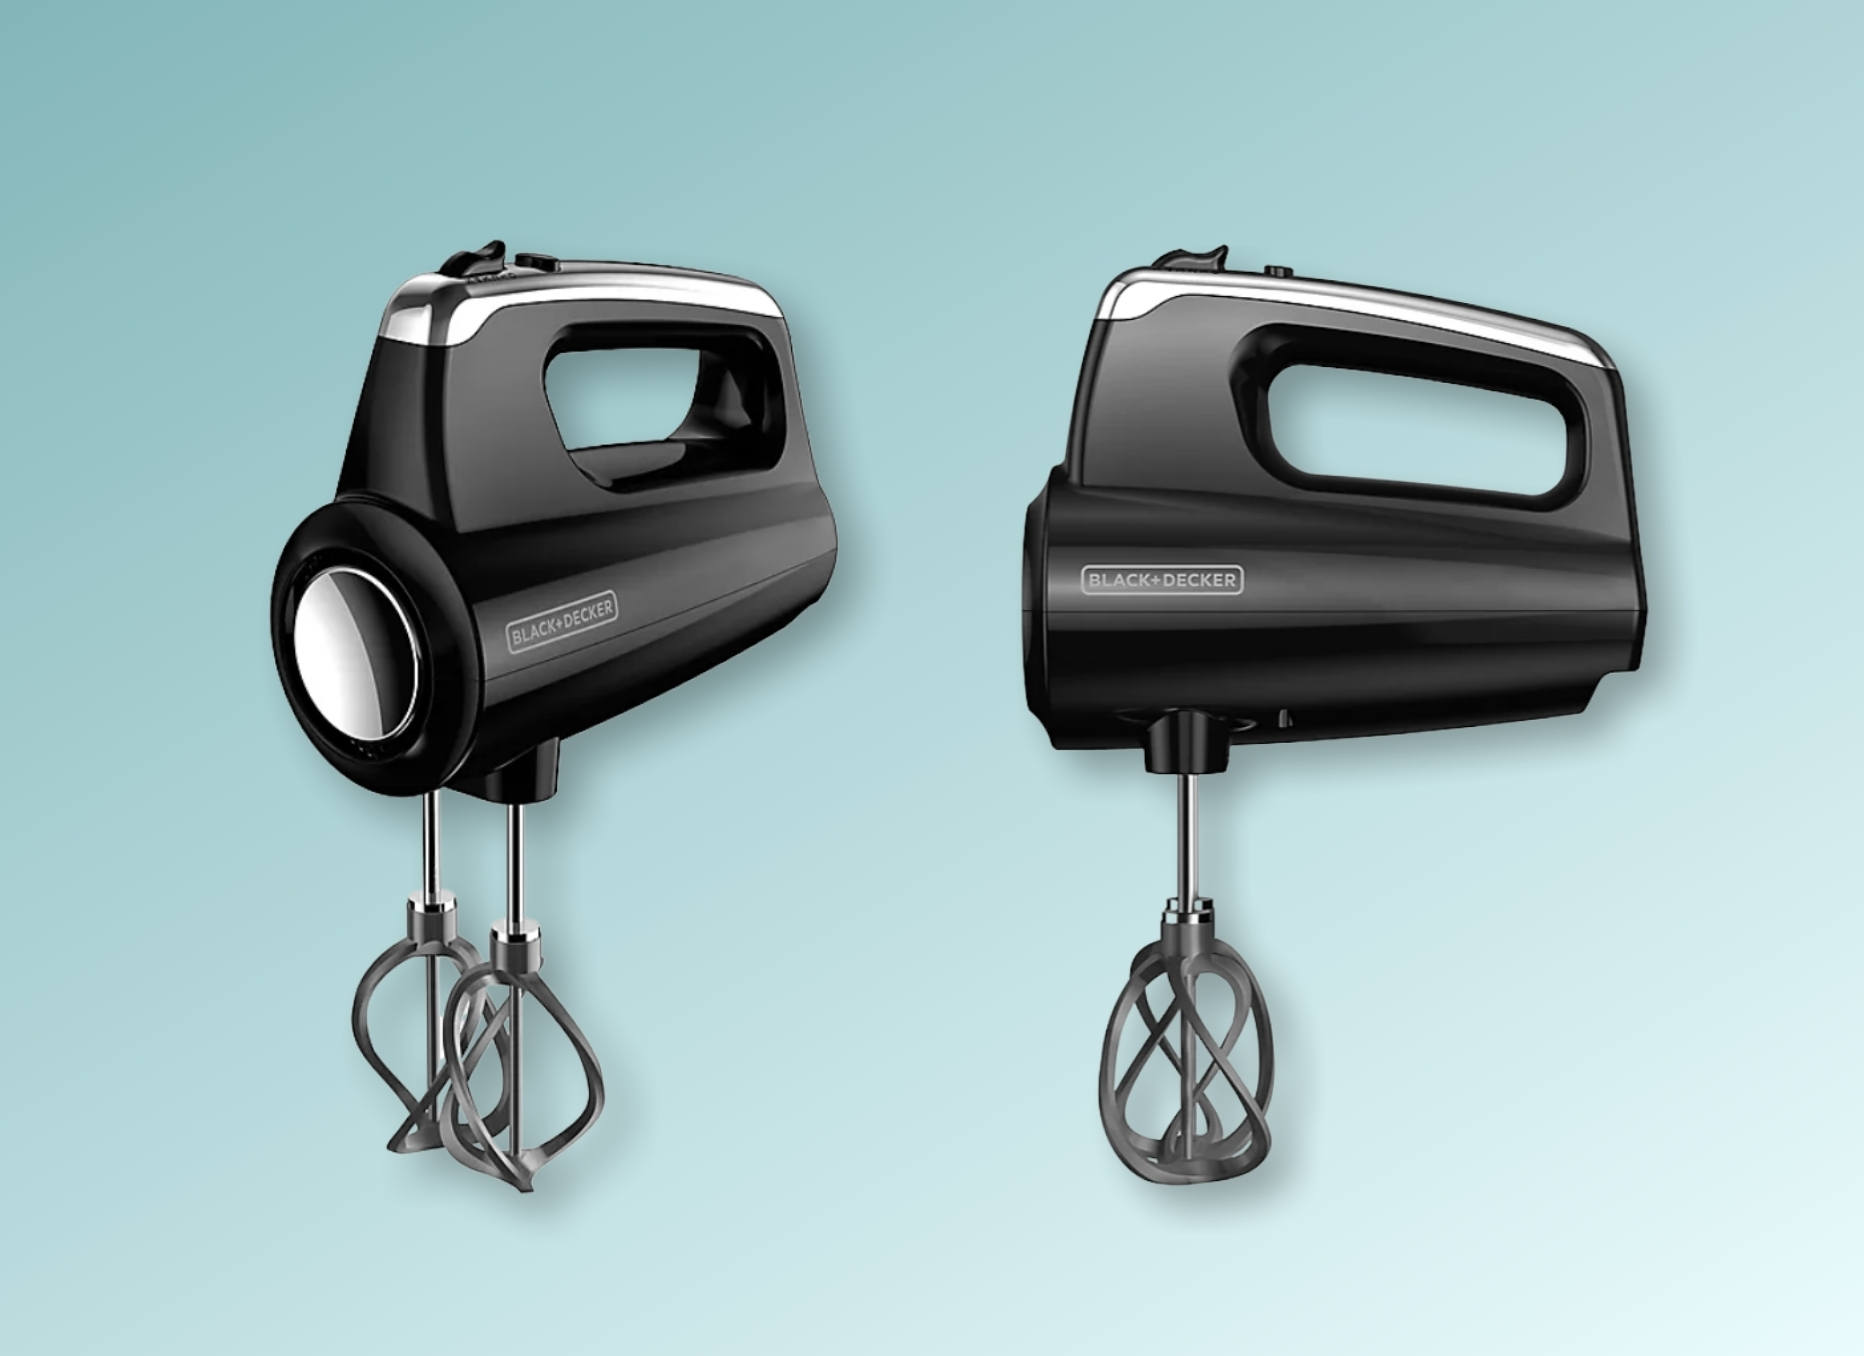 Black and Decker Helix Hand Mixer